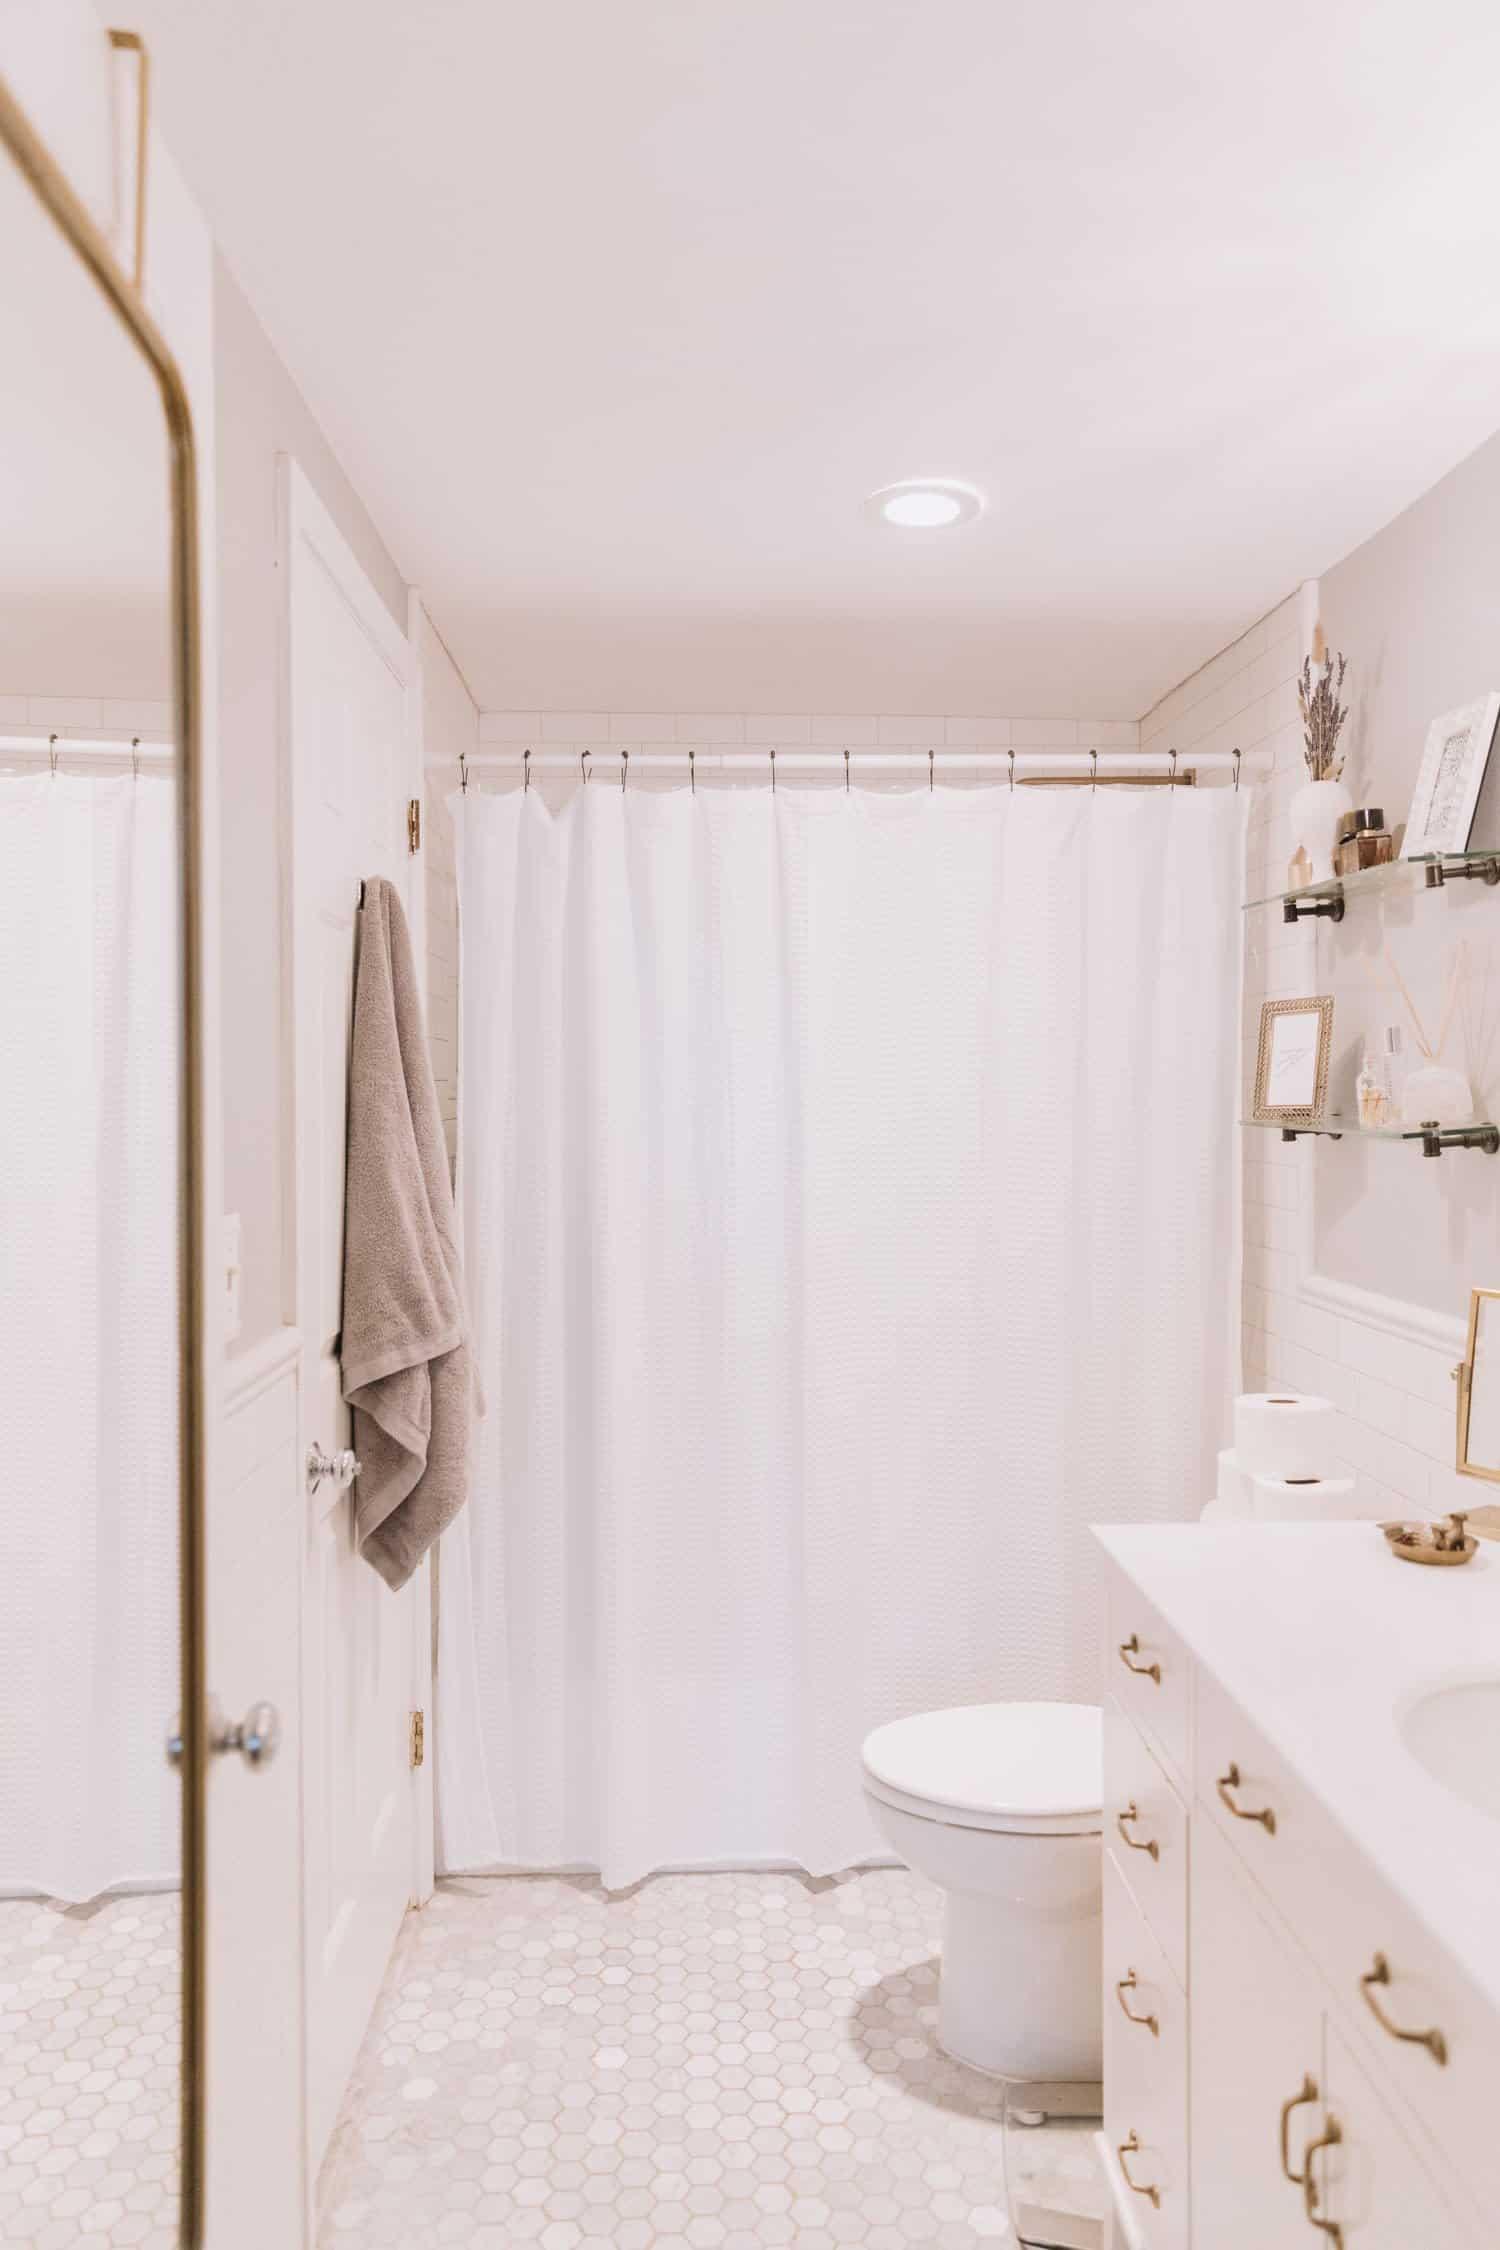 target casaluna collection, white bathroom